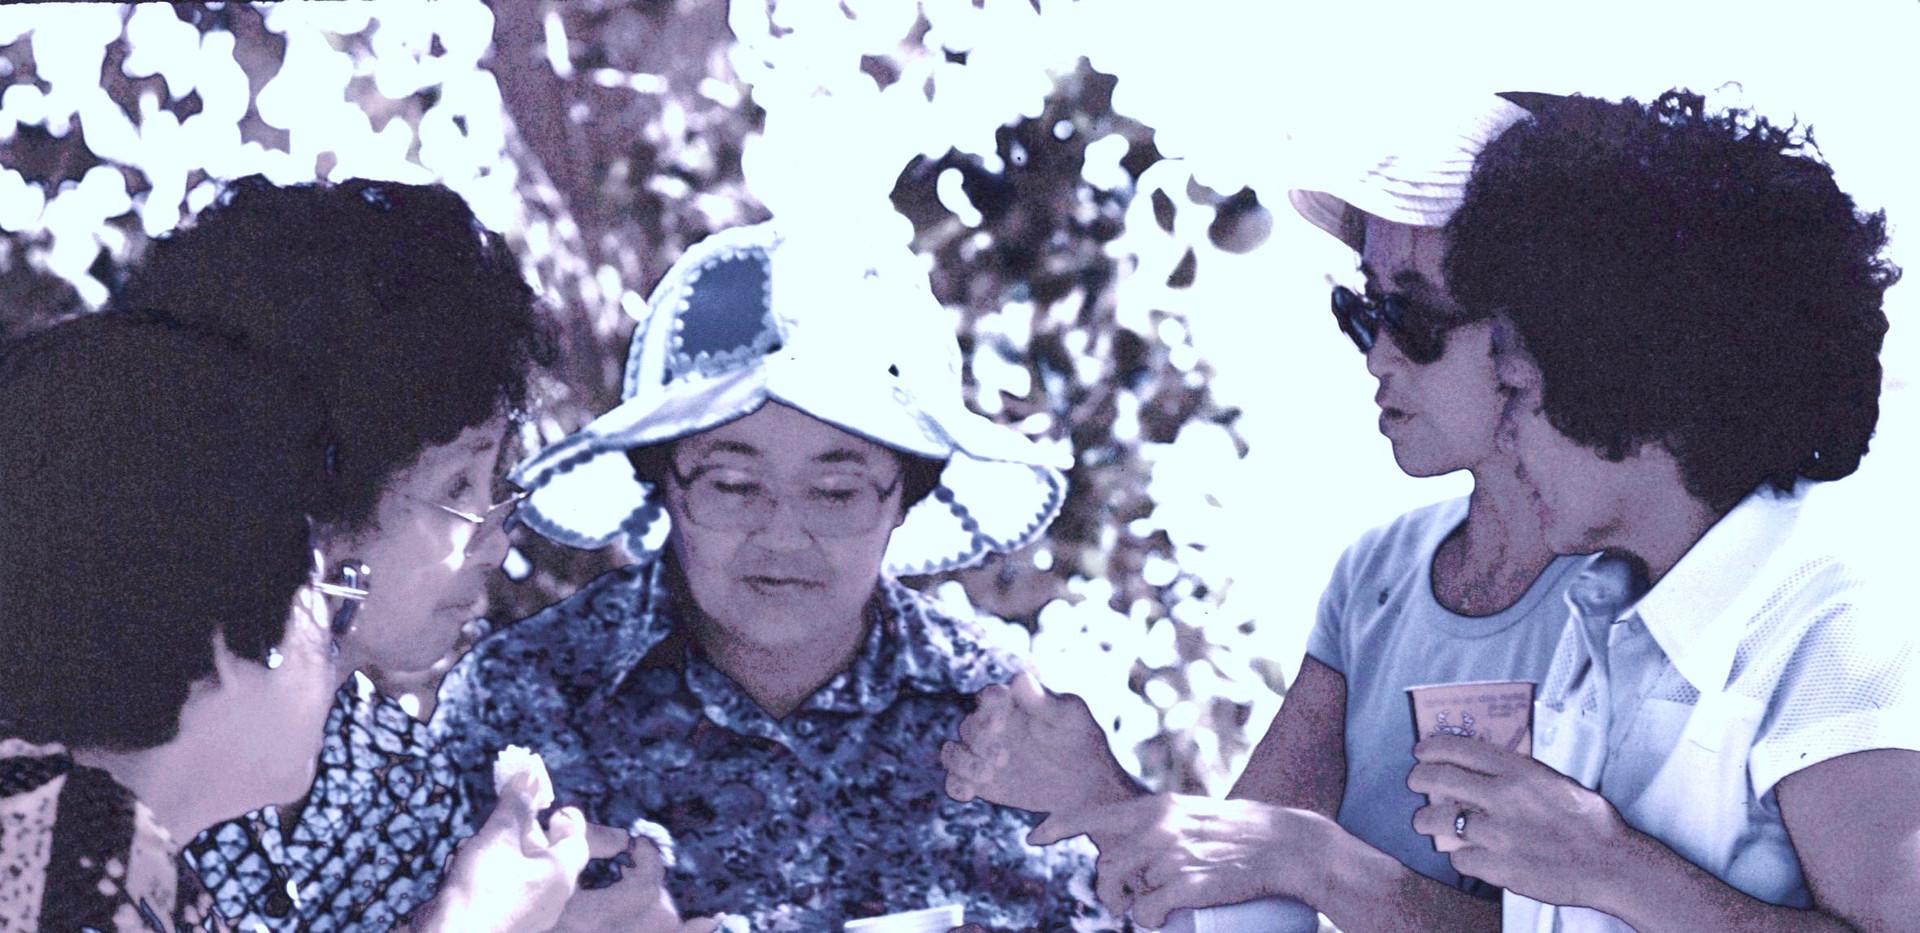 Itaya family reunion  (ca. 1979)